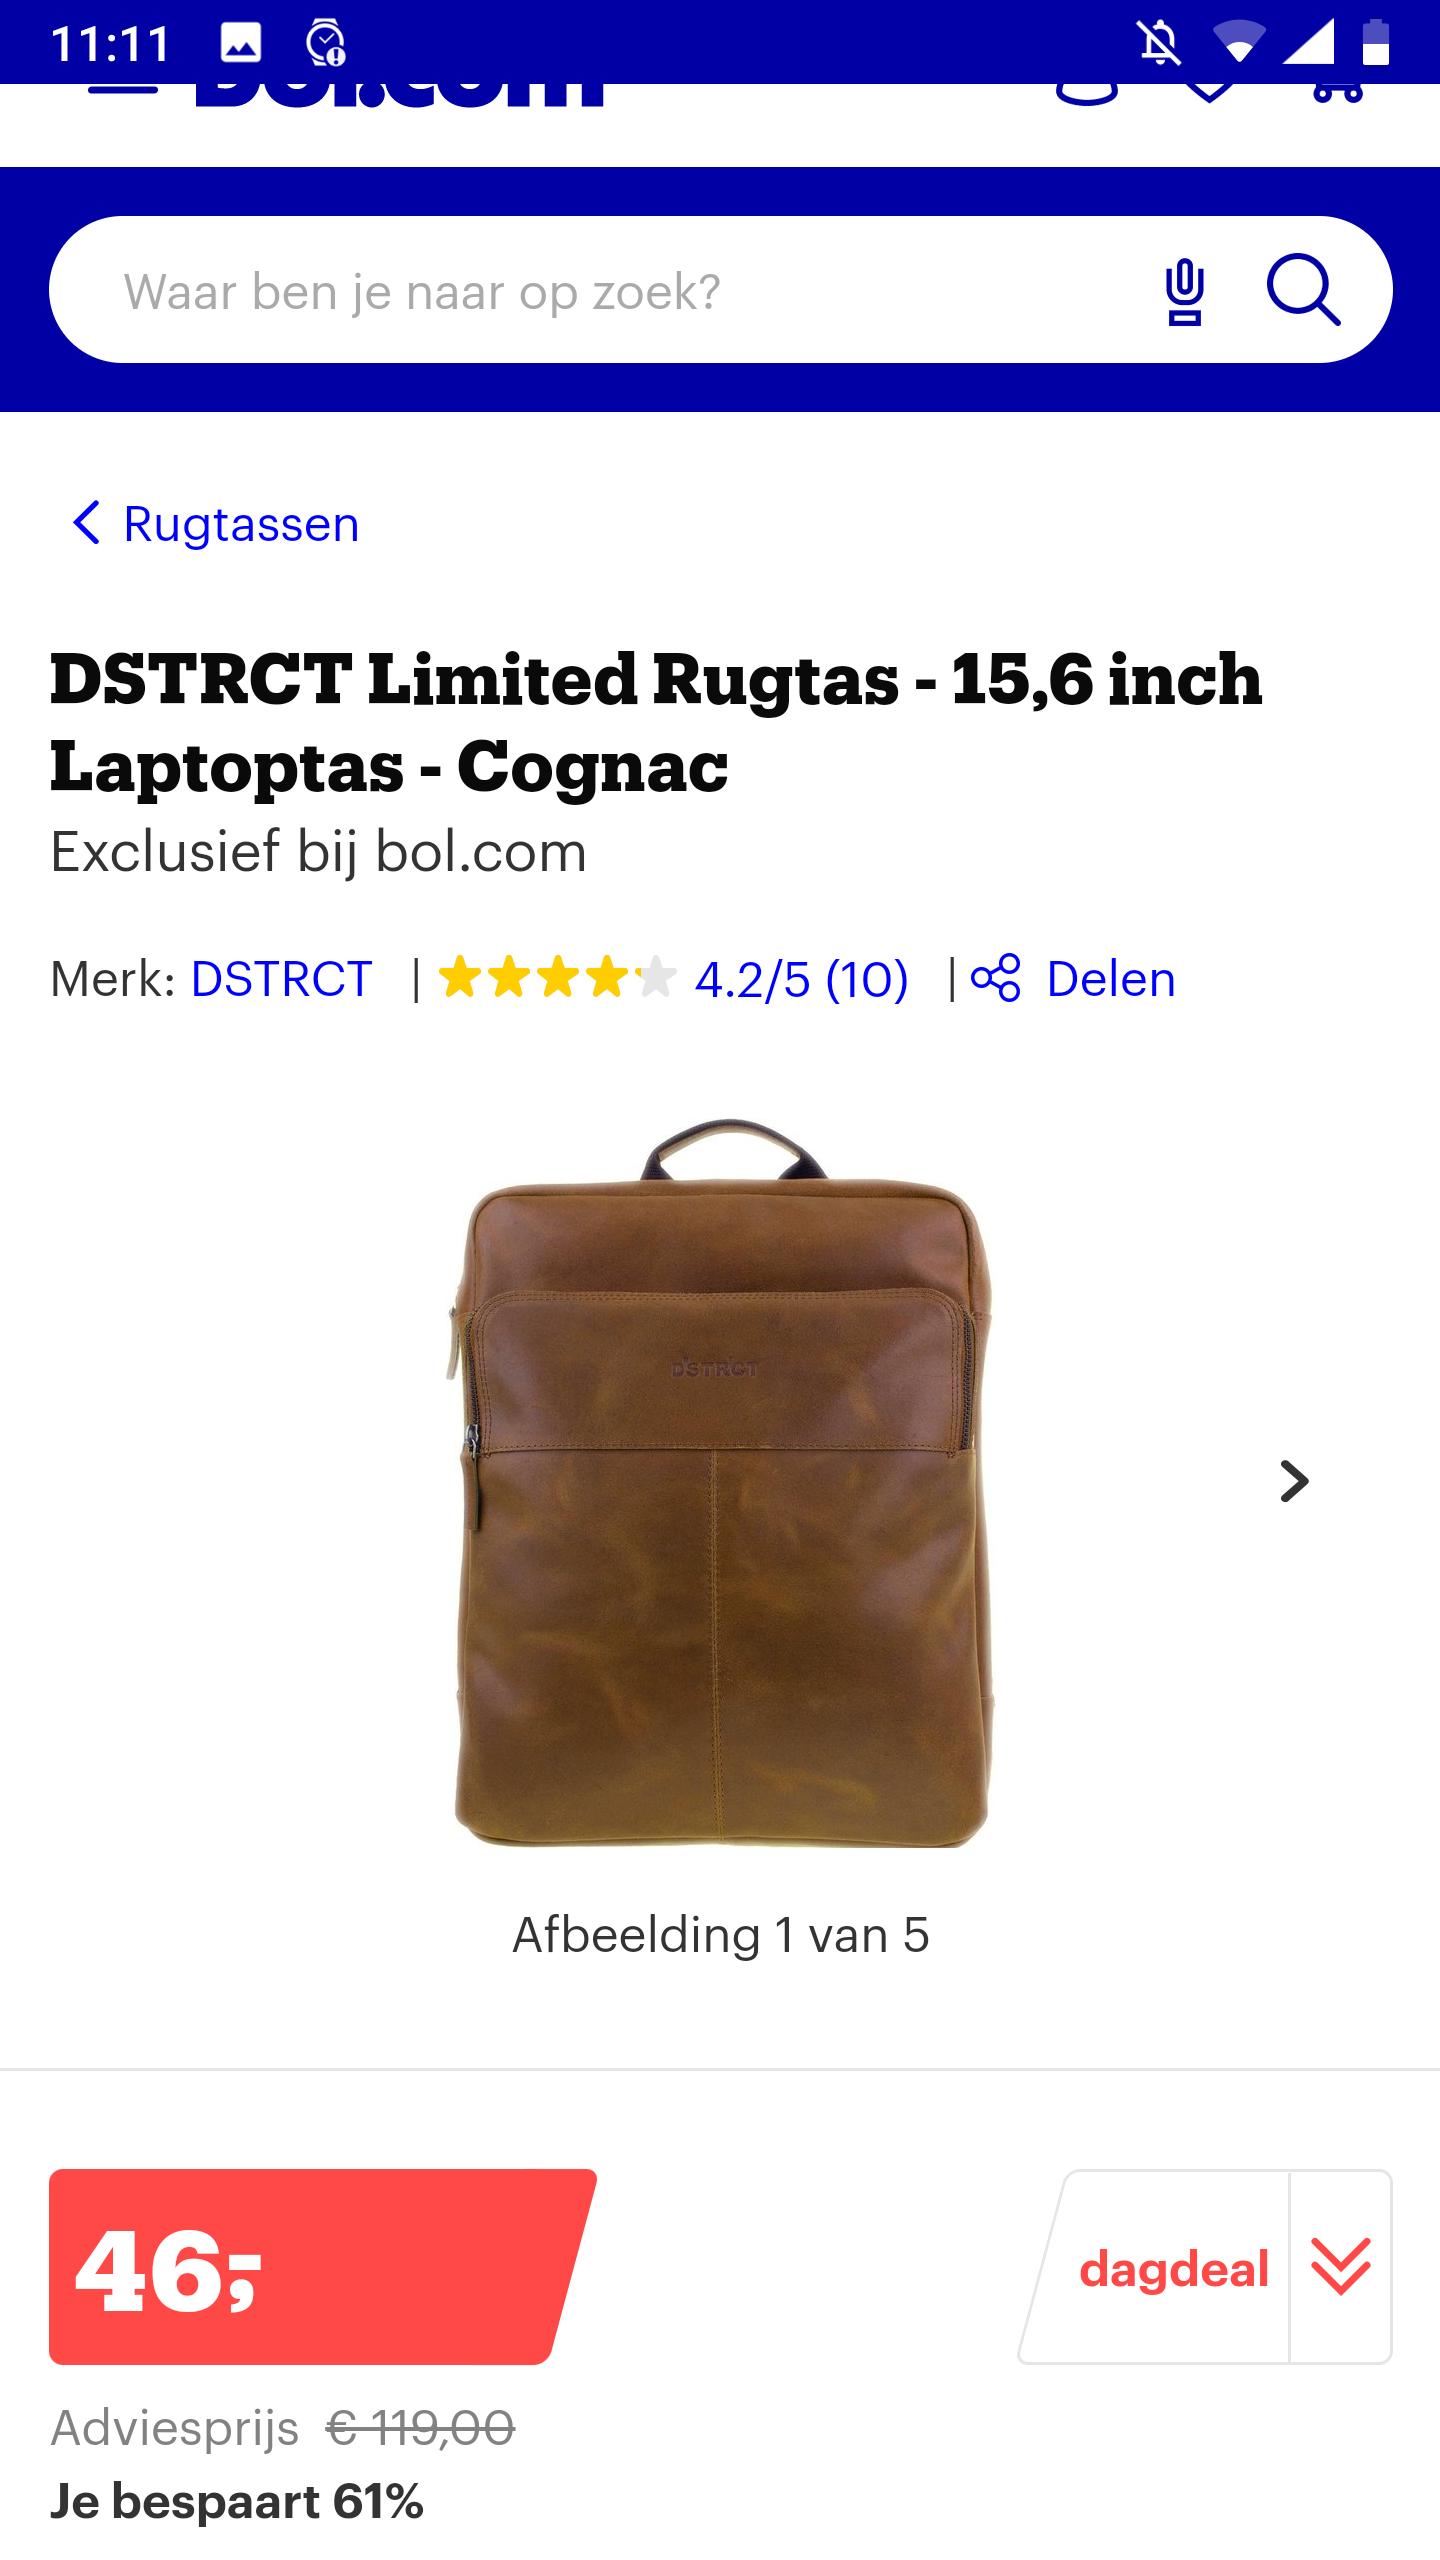 DSTRCT Limited Rugtas - 15,6 inch Laptoptas - Cognac